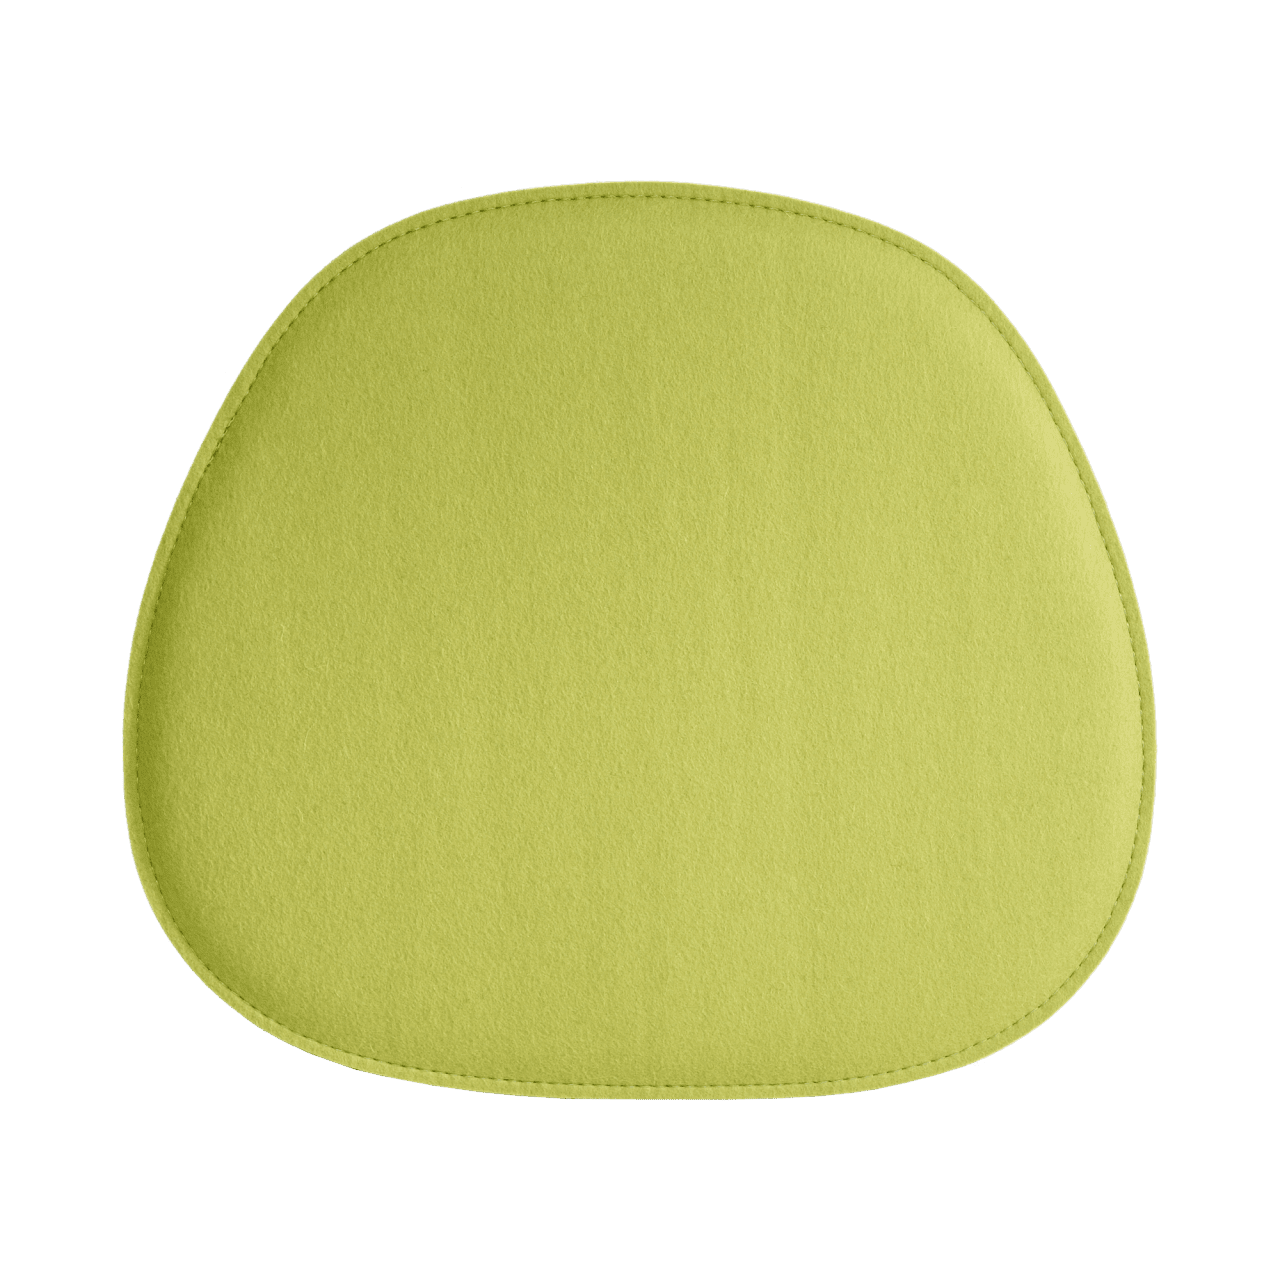 Sitzauflage Eames Plastic Chair